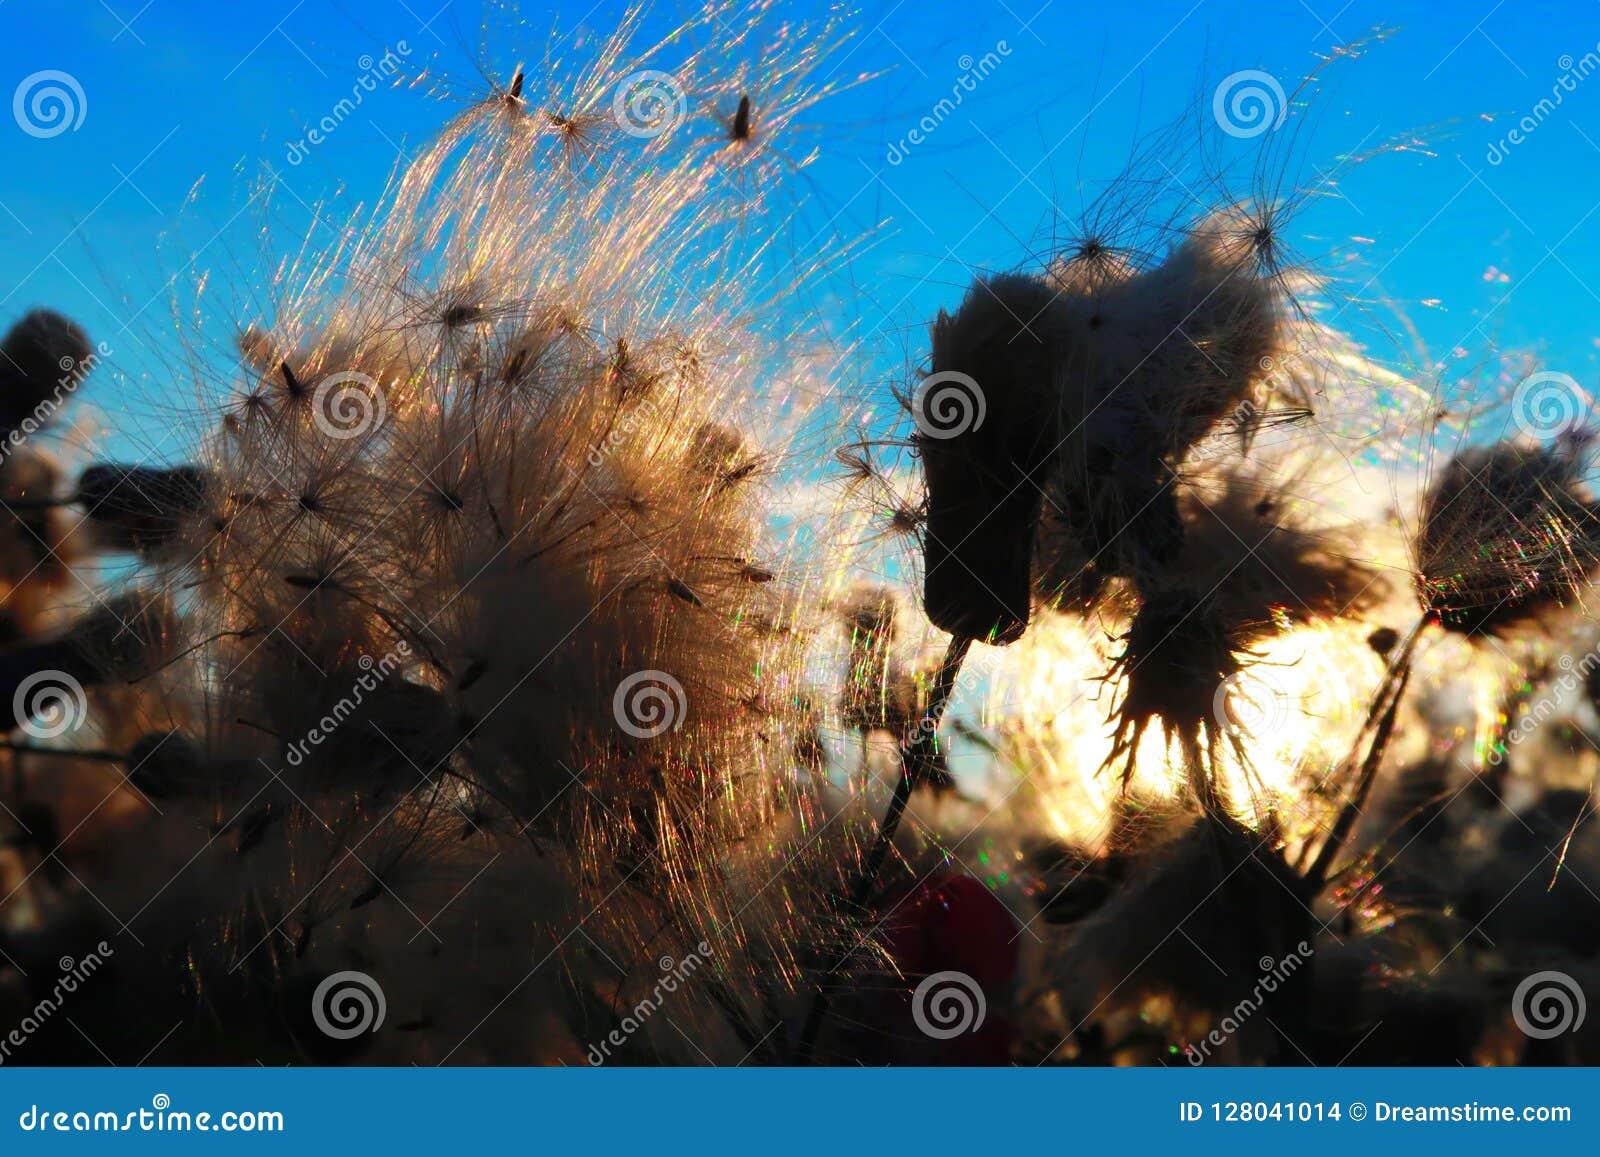 Ветер лета на поле Цветки и семена, пушистые, дуют ветер